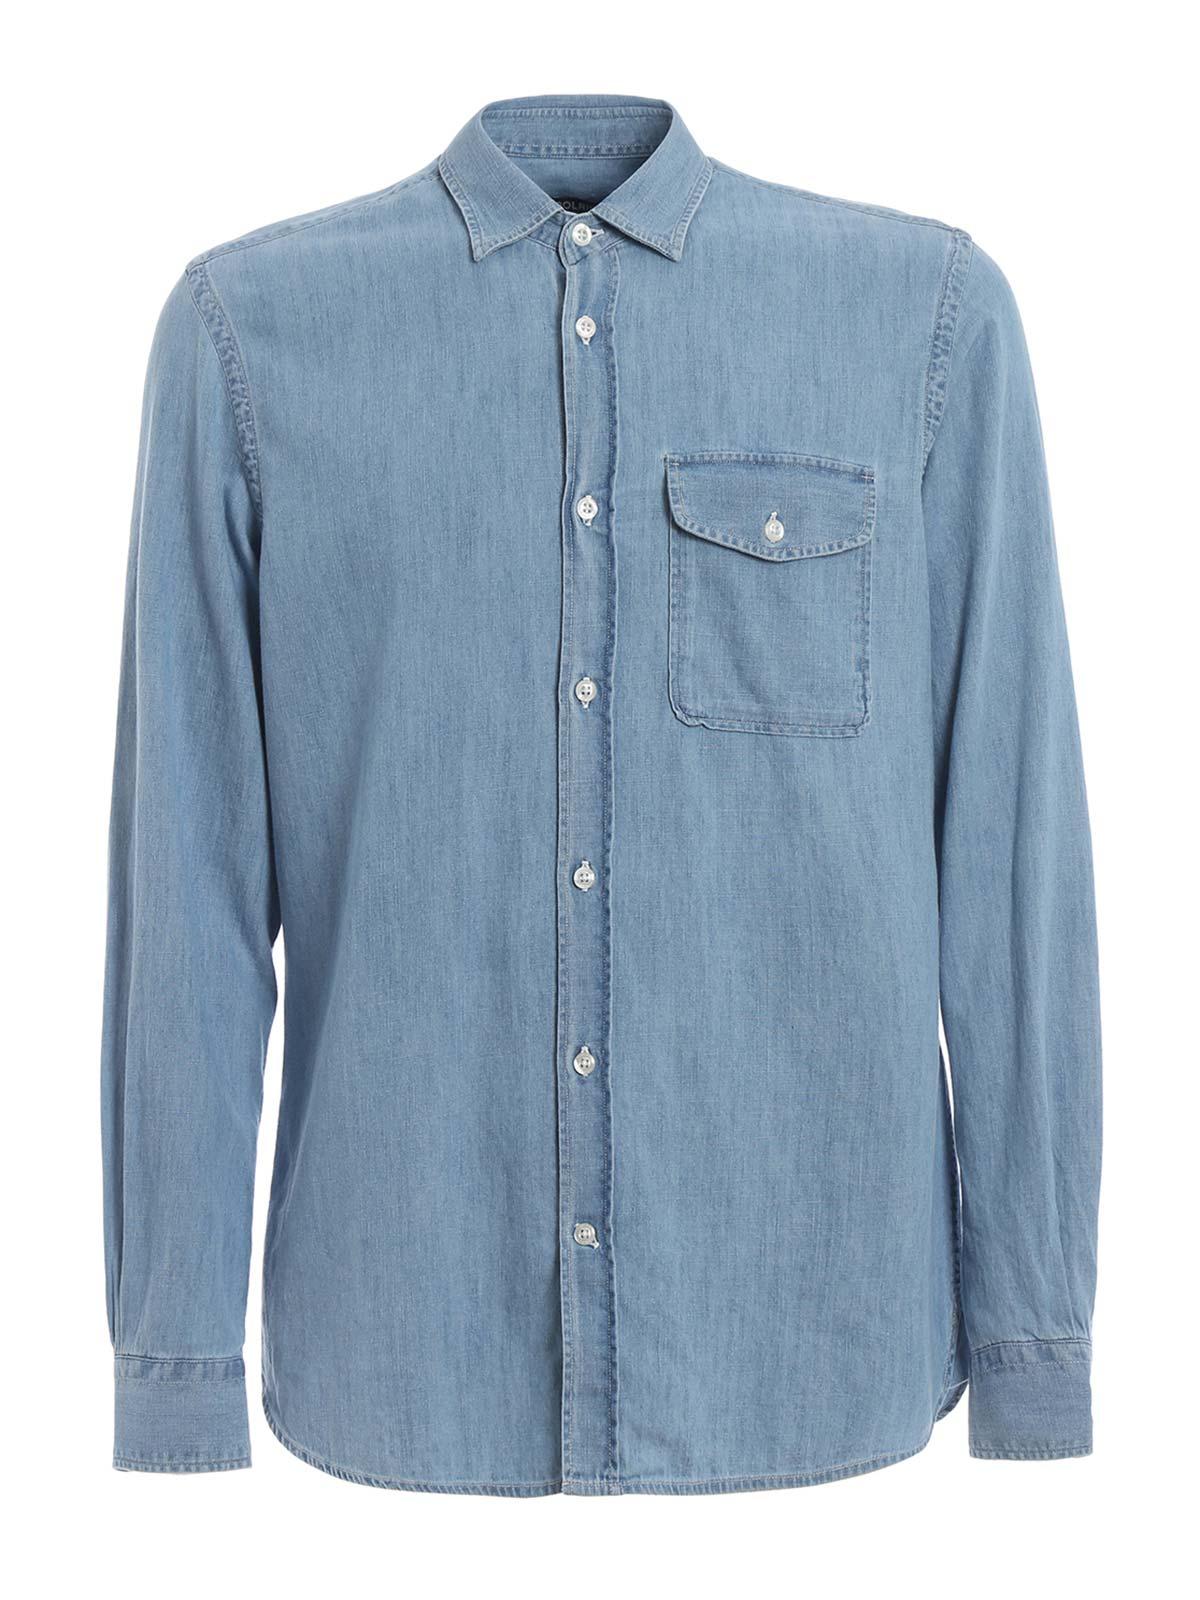 Picture of WOOLRICH | Men's Denim Shirt